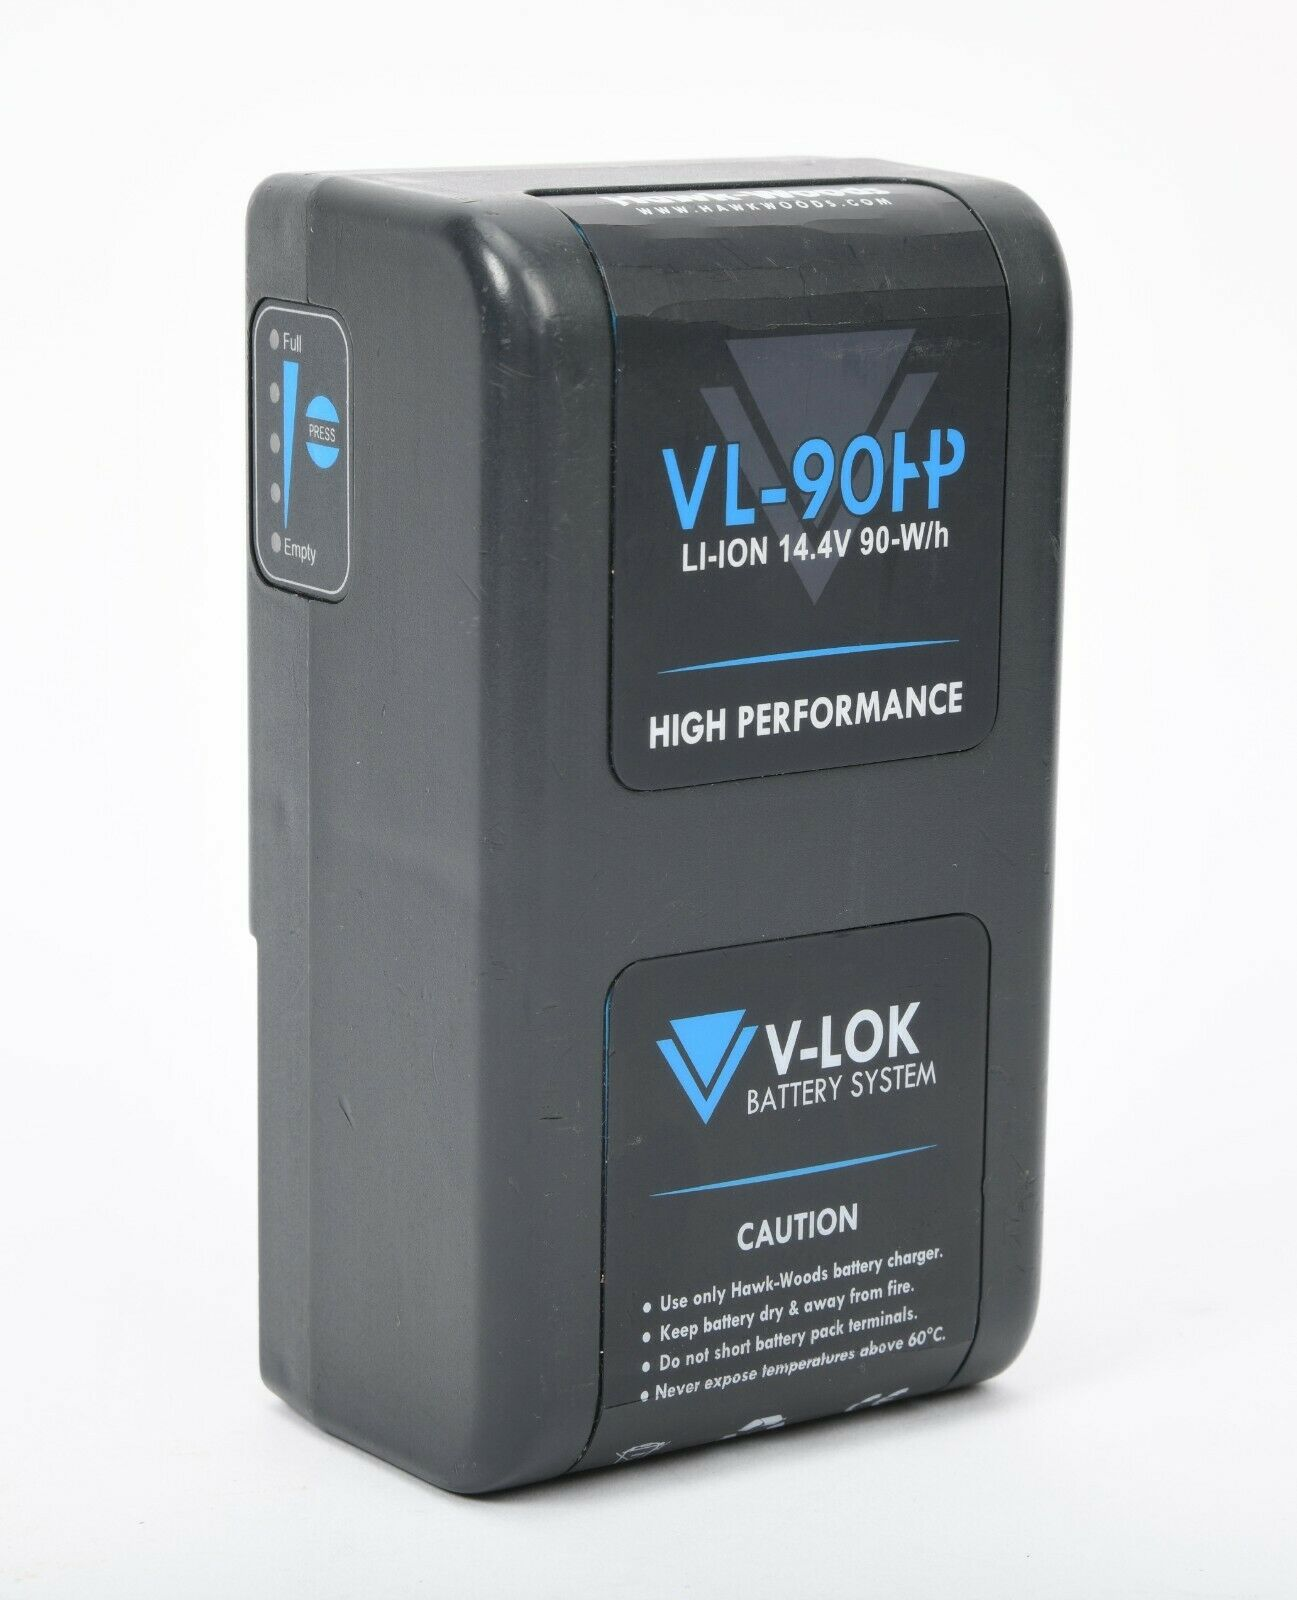 Hawk-Woods VL-90H 90Wh 14.4V V-Mount High Performance Lithium-Ion Battery